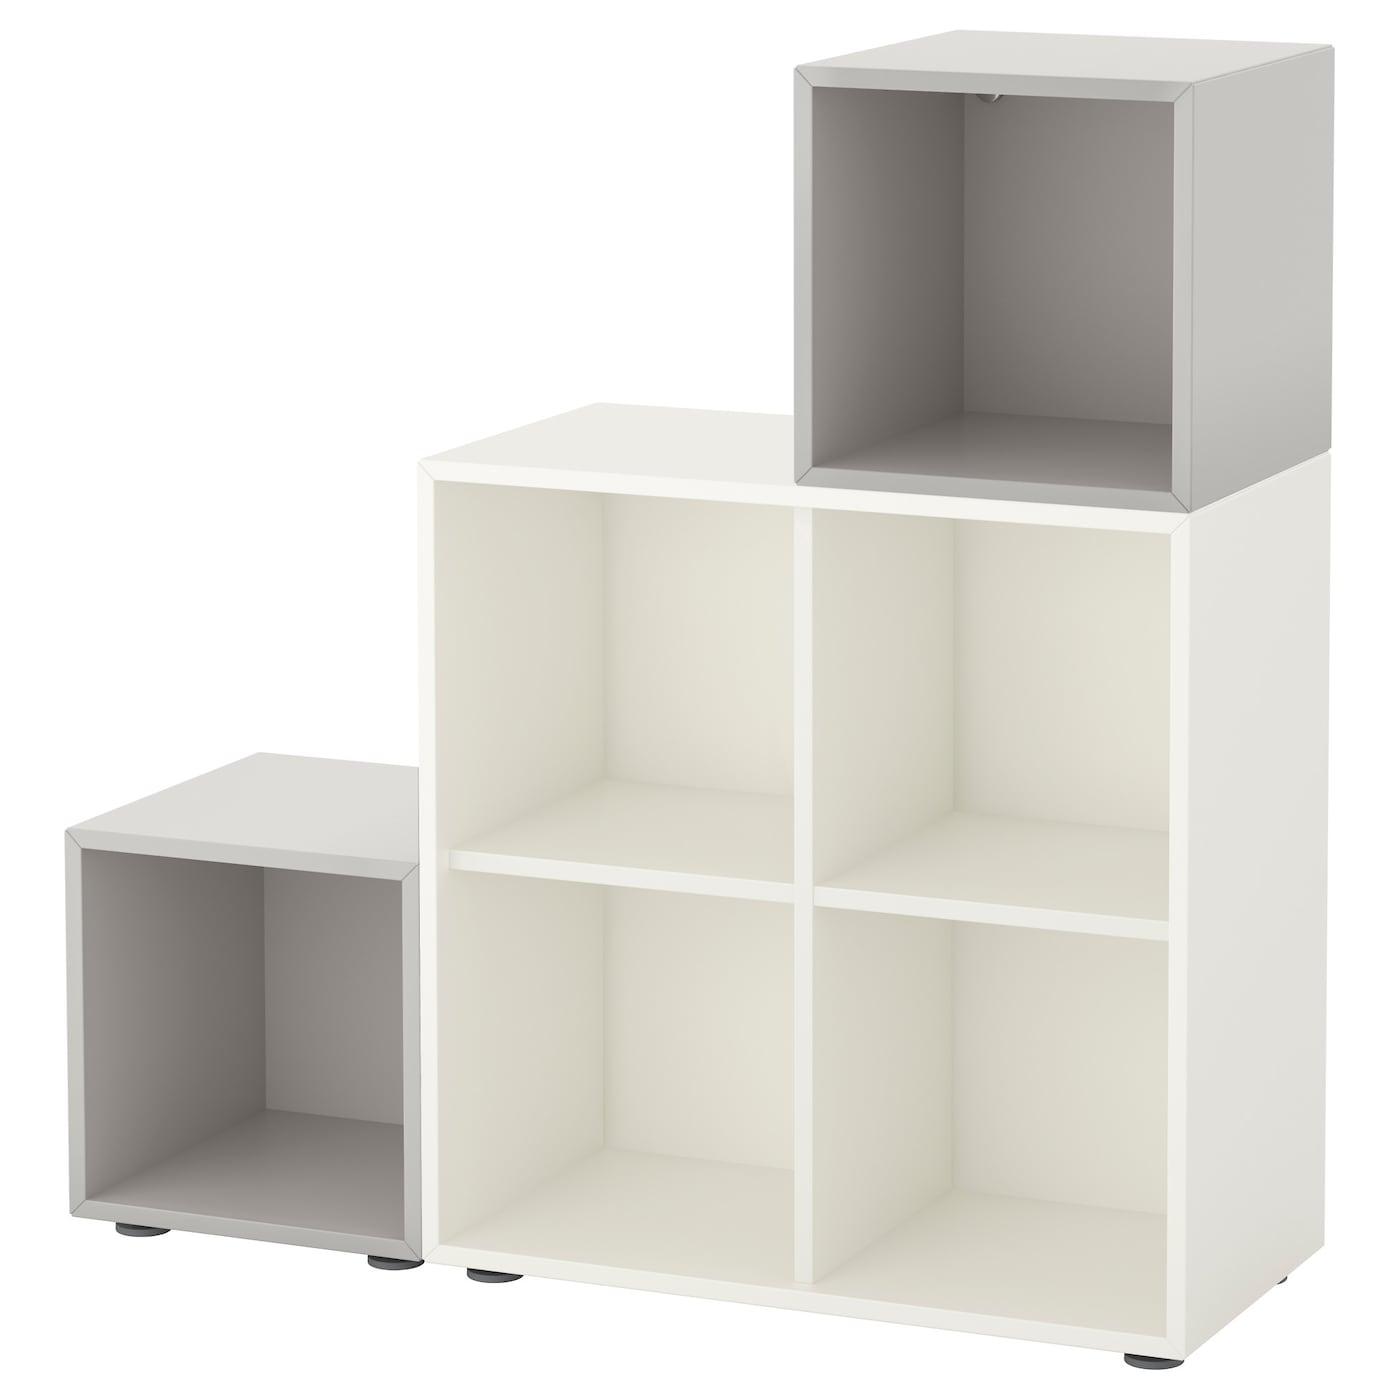 eket cabinet combination with feet white light grey 105 x 35 x 107 cm ikea. Black Bedroom Furniture Sets. Home Design Ideas